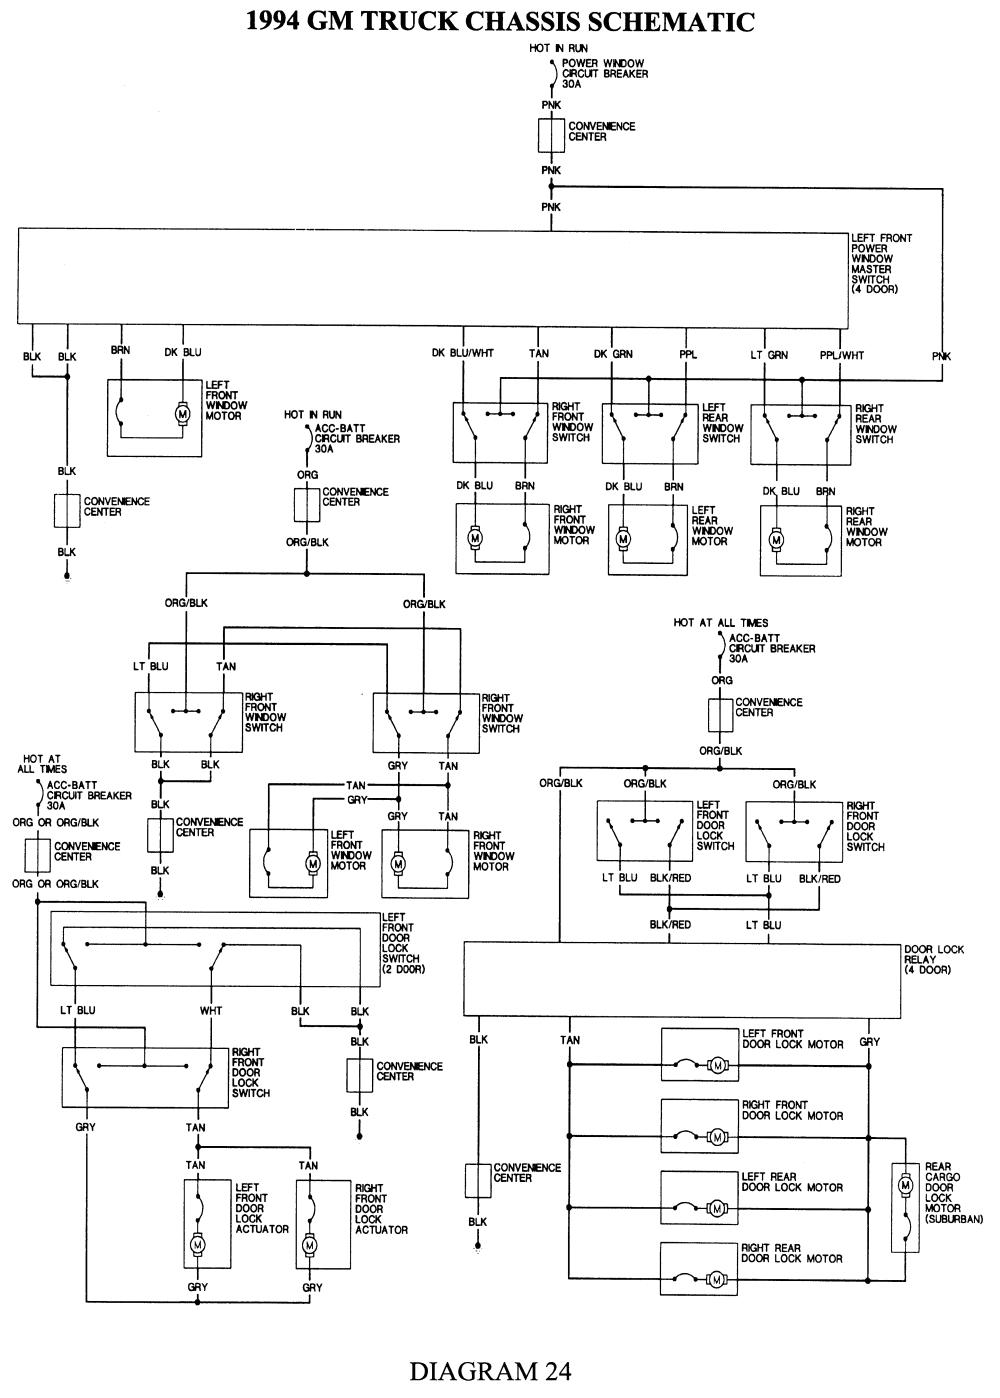 2004 chevy 2500hd trailer wiring diagram